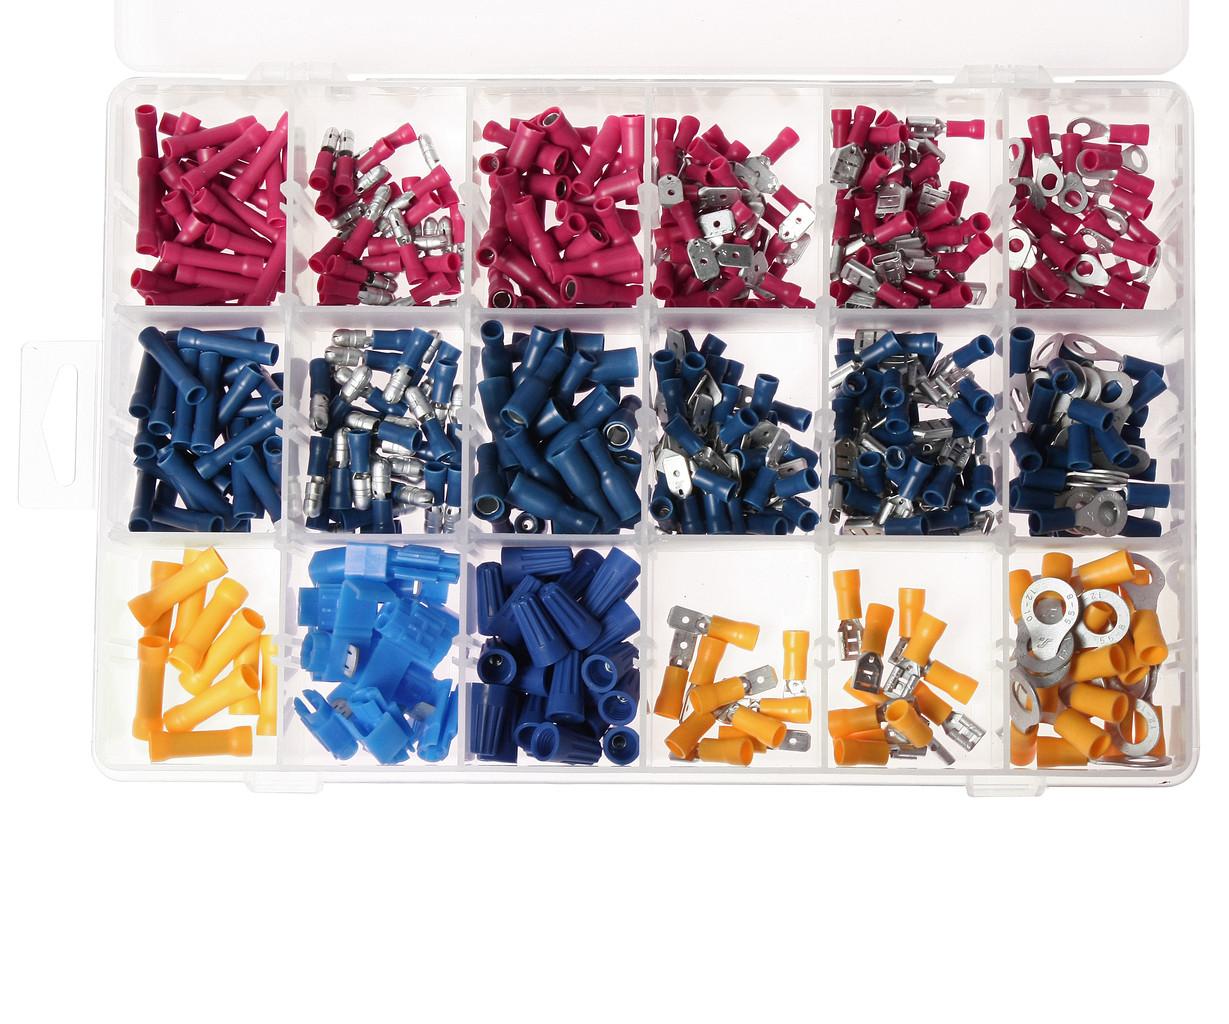 JTC Набор клемм электропроводки изолированных 18 типоразмеров (в боксе) 530шт. JTC - фото 2